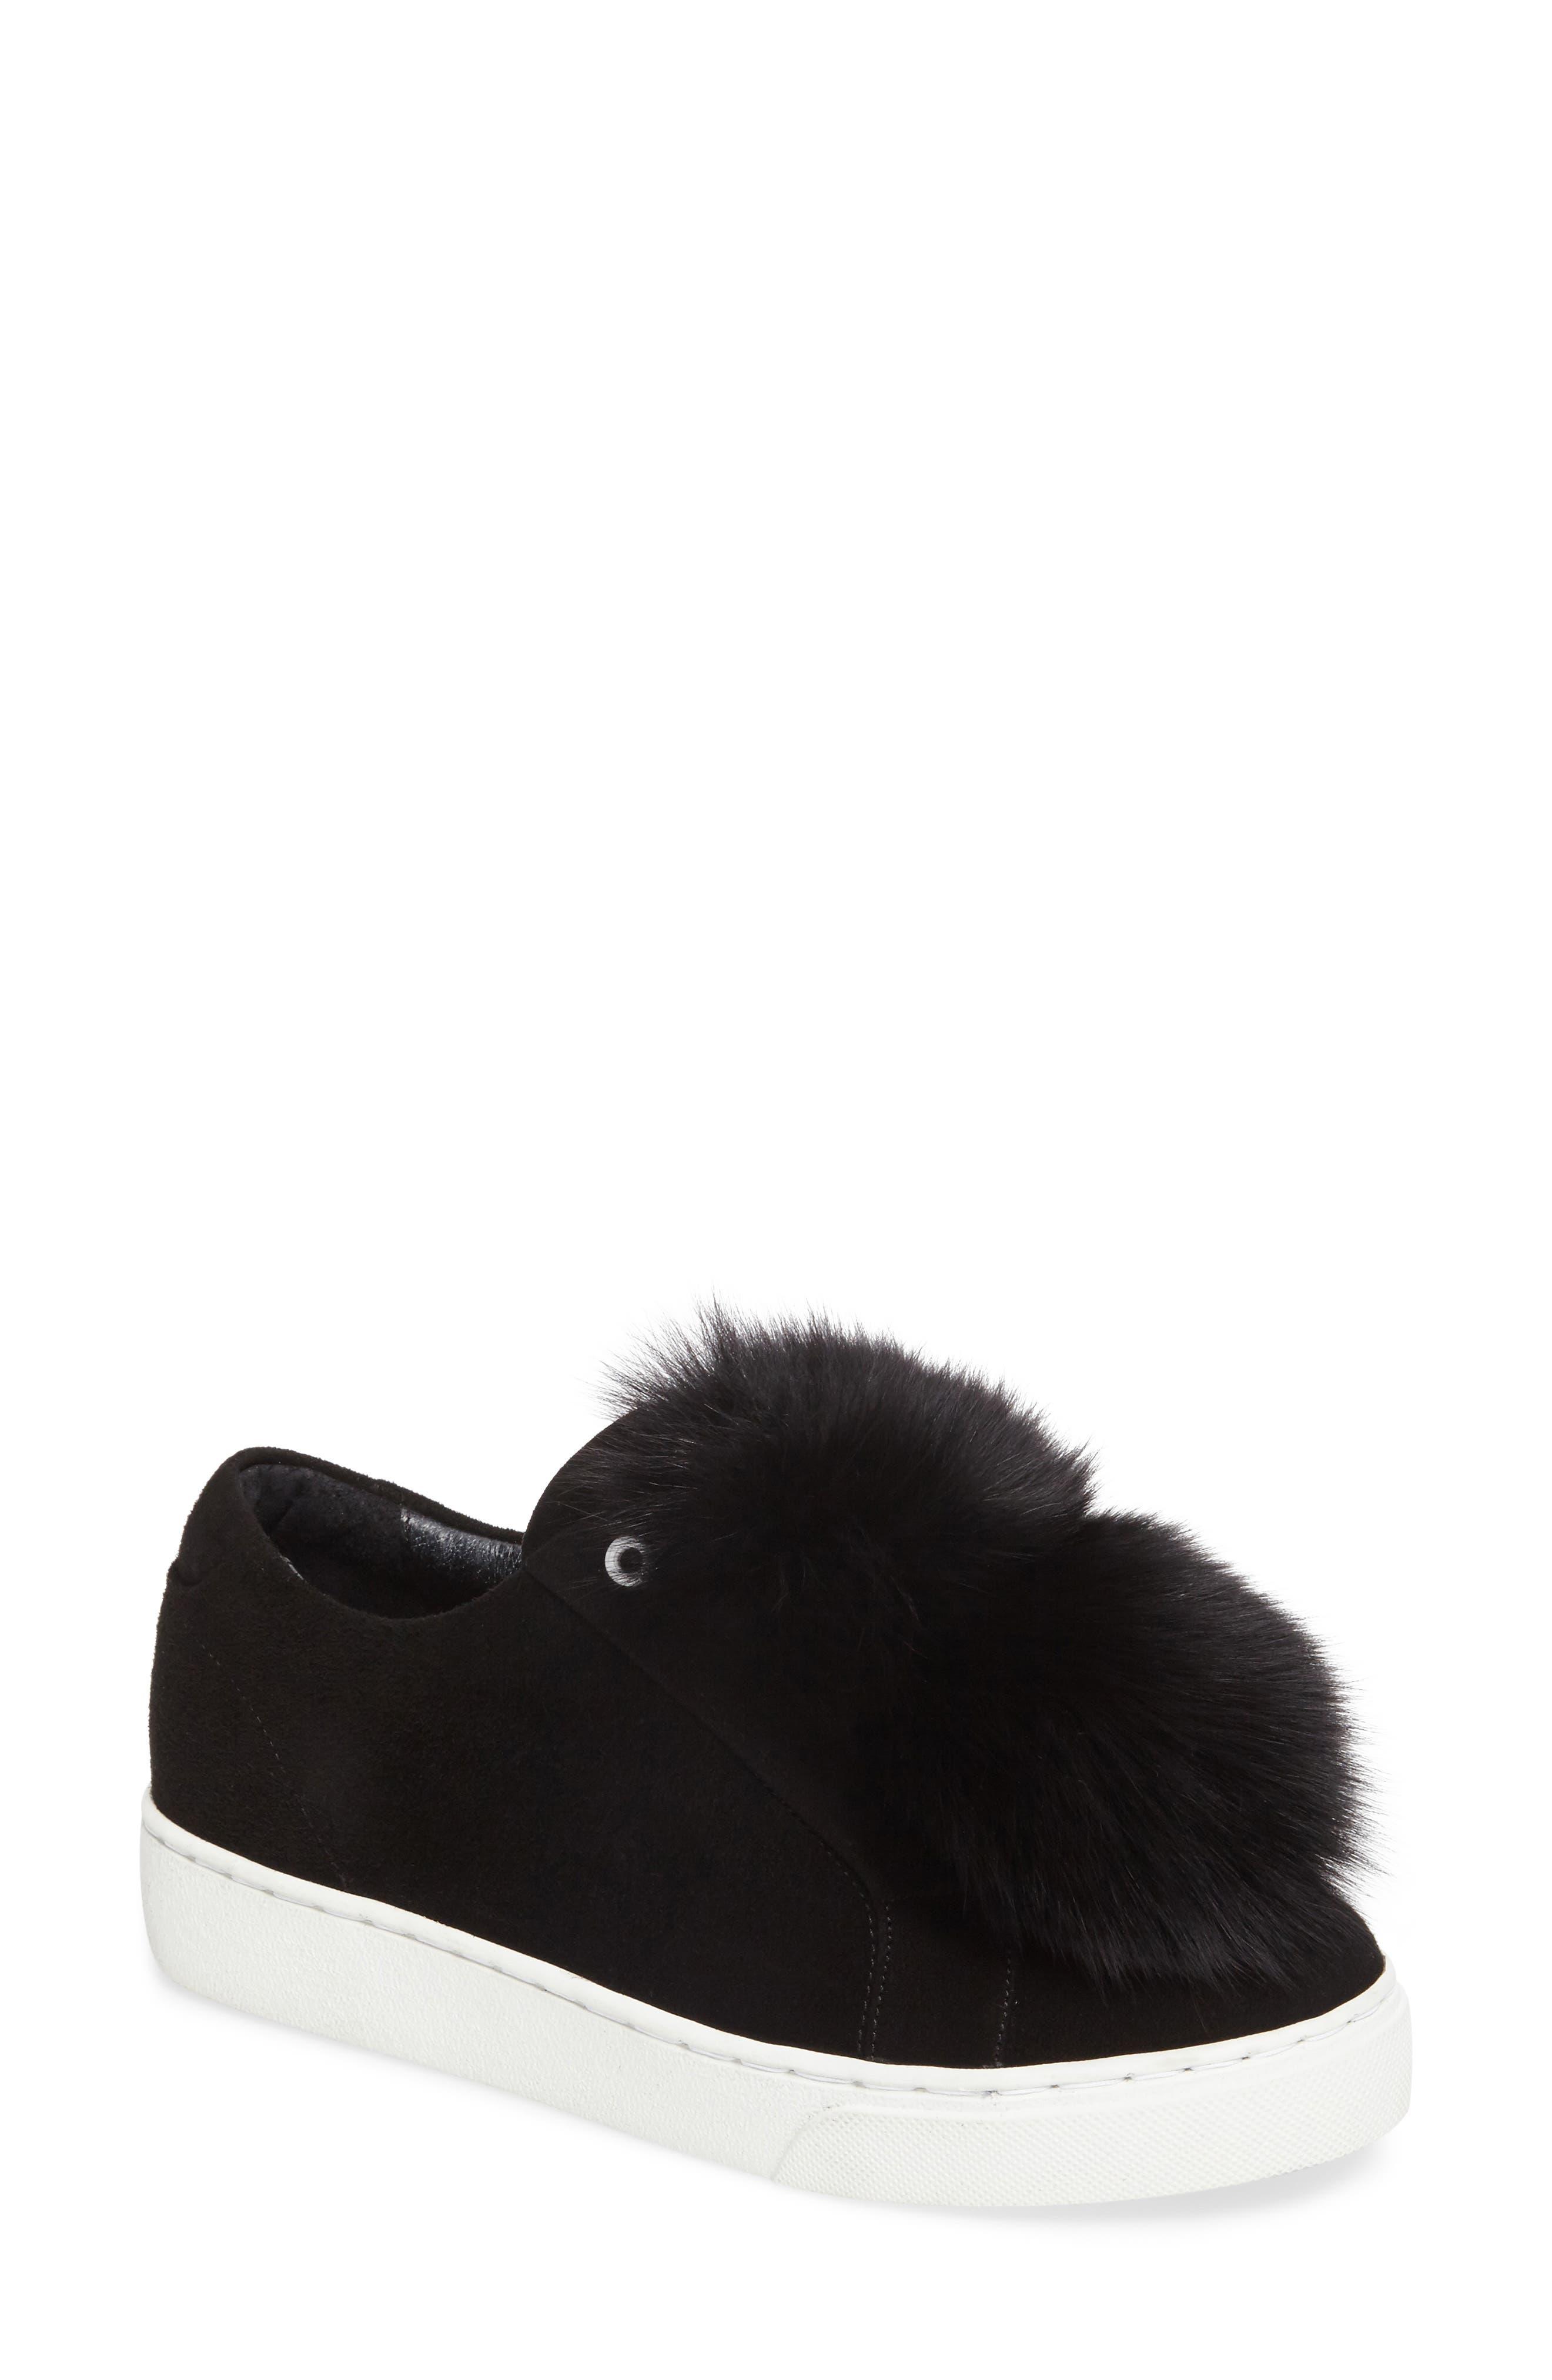 Alternate Image 1 Selected - Here / Now Raven Genuine Fox Fur Trim Sneaker (Women)